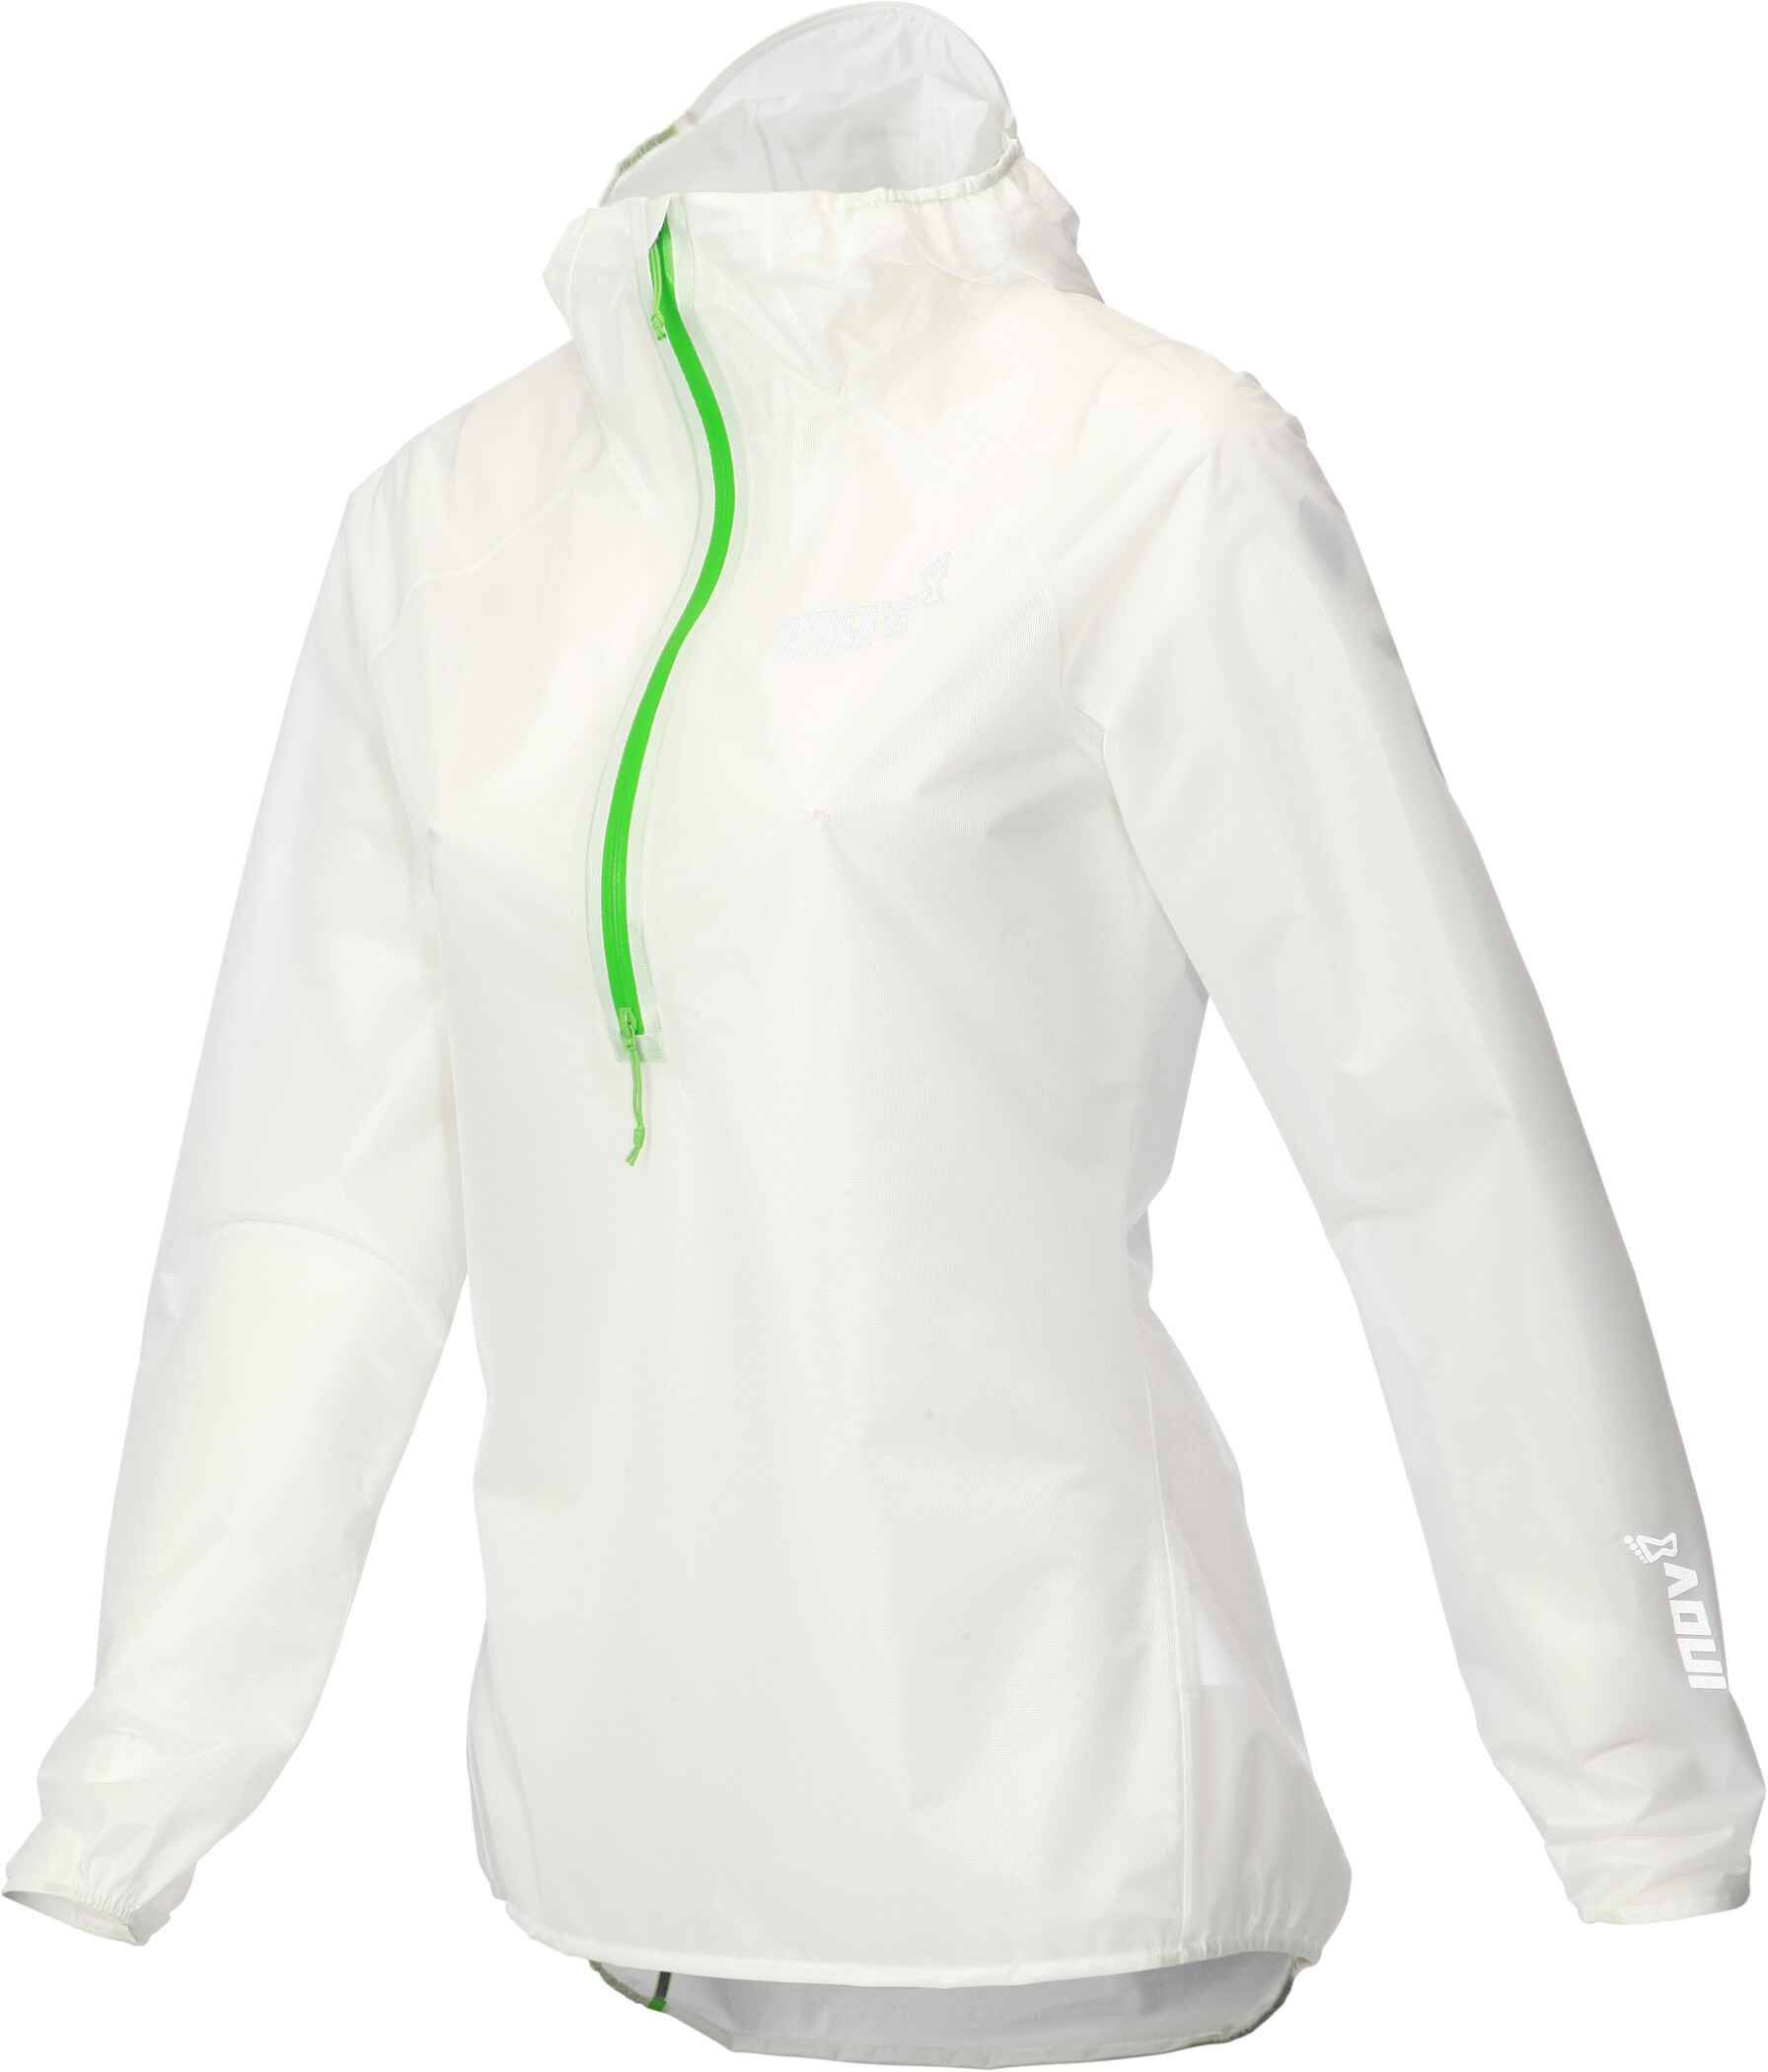 inov-8 Ultrashell HZ Damer, clear (2019)   Jackets